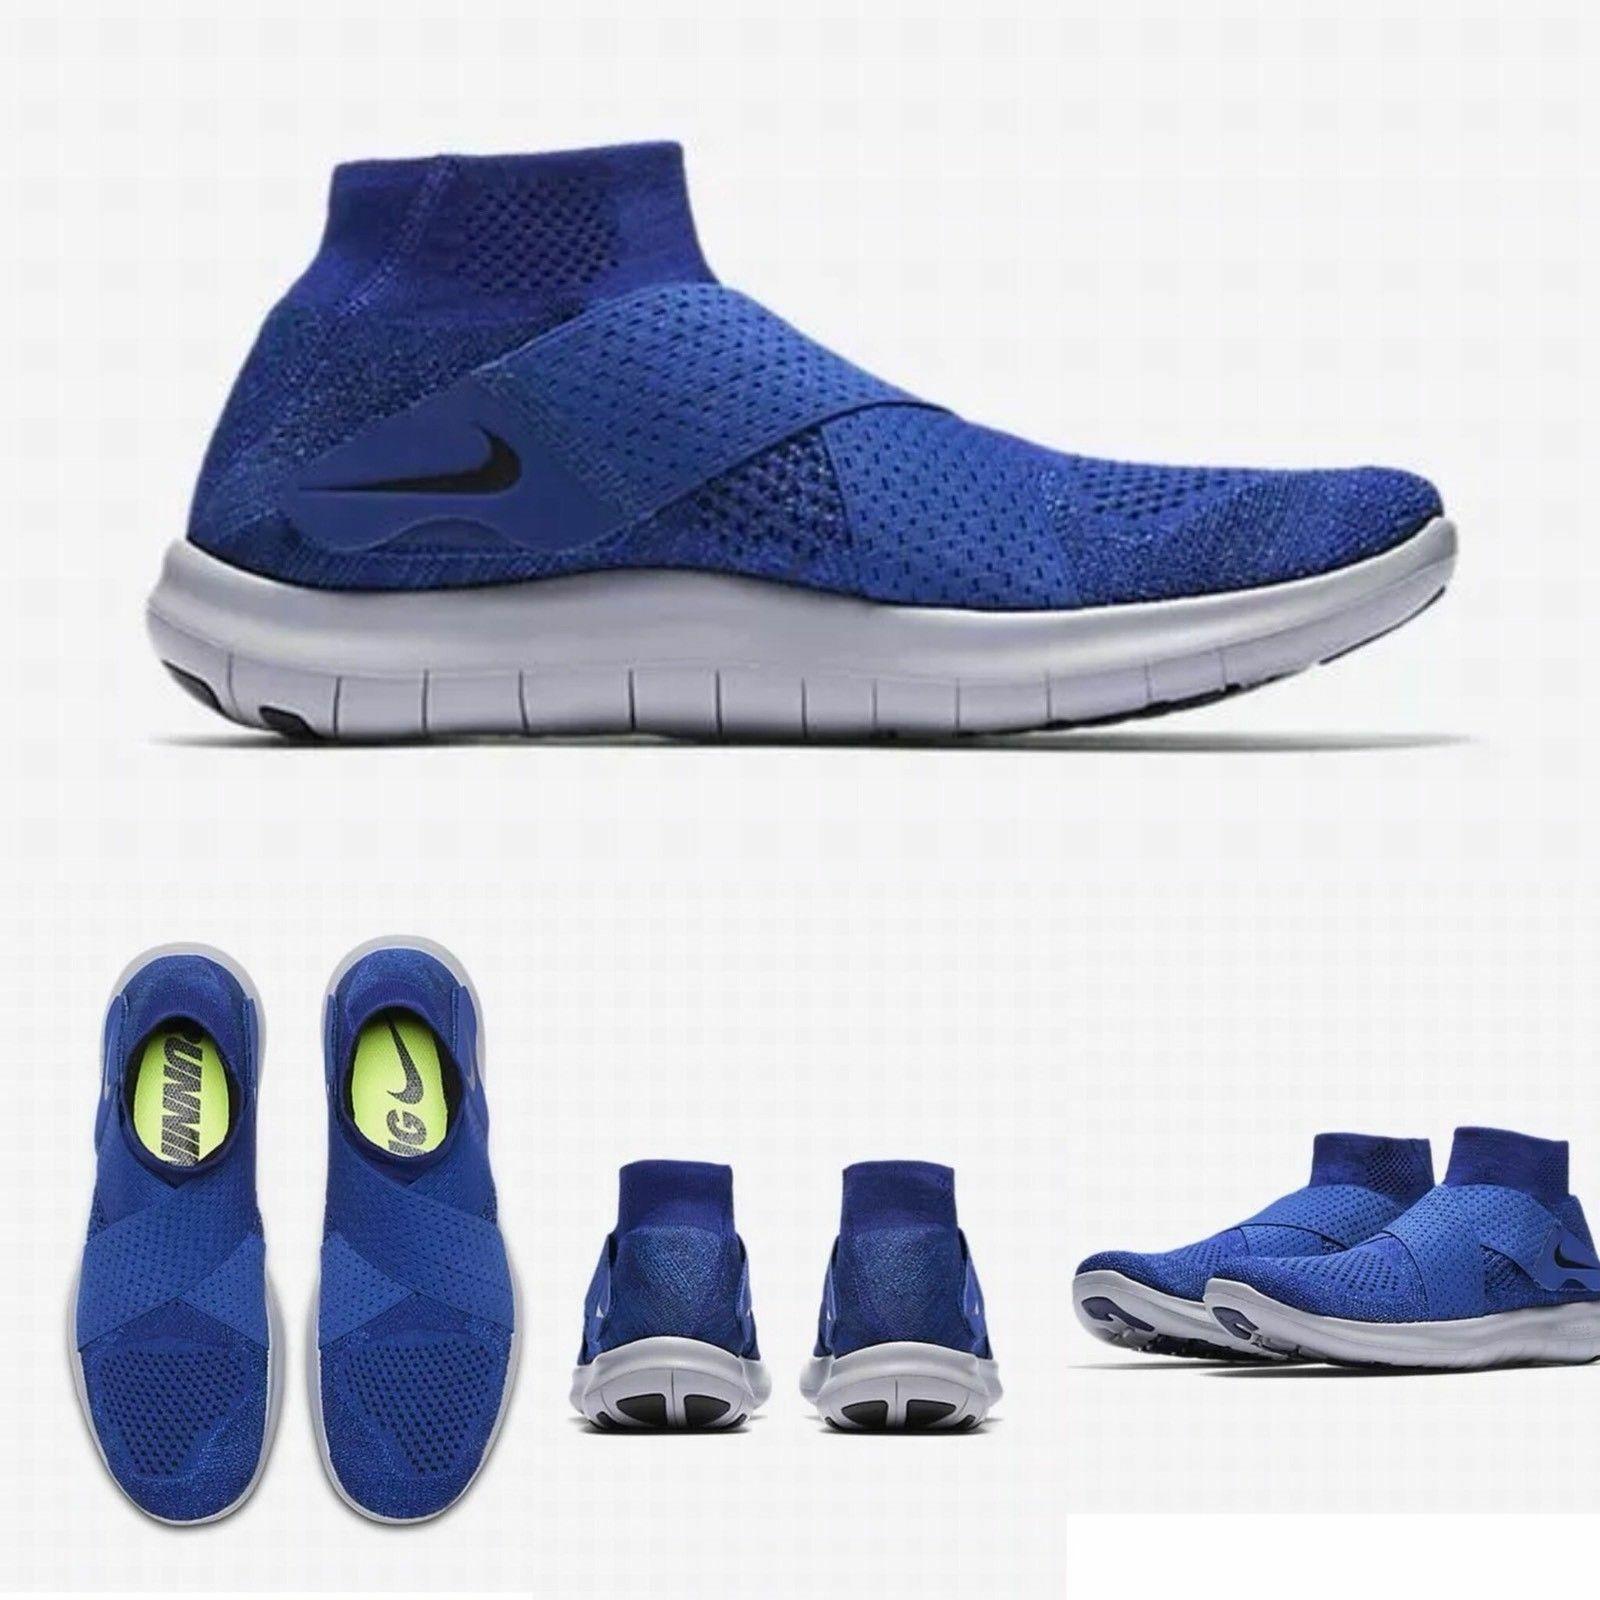 Men Nike Free Motion Flyknit 2017 Running shoes - Many size